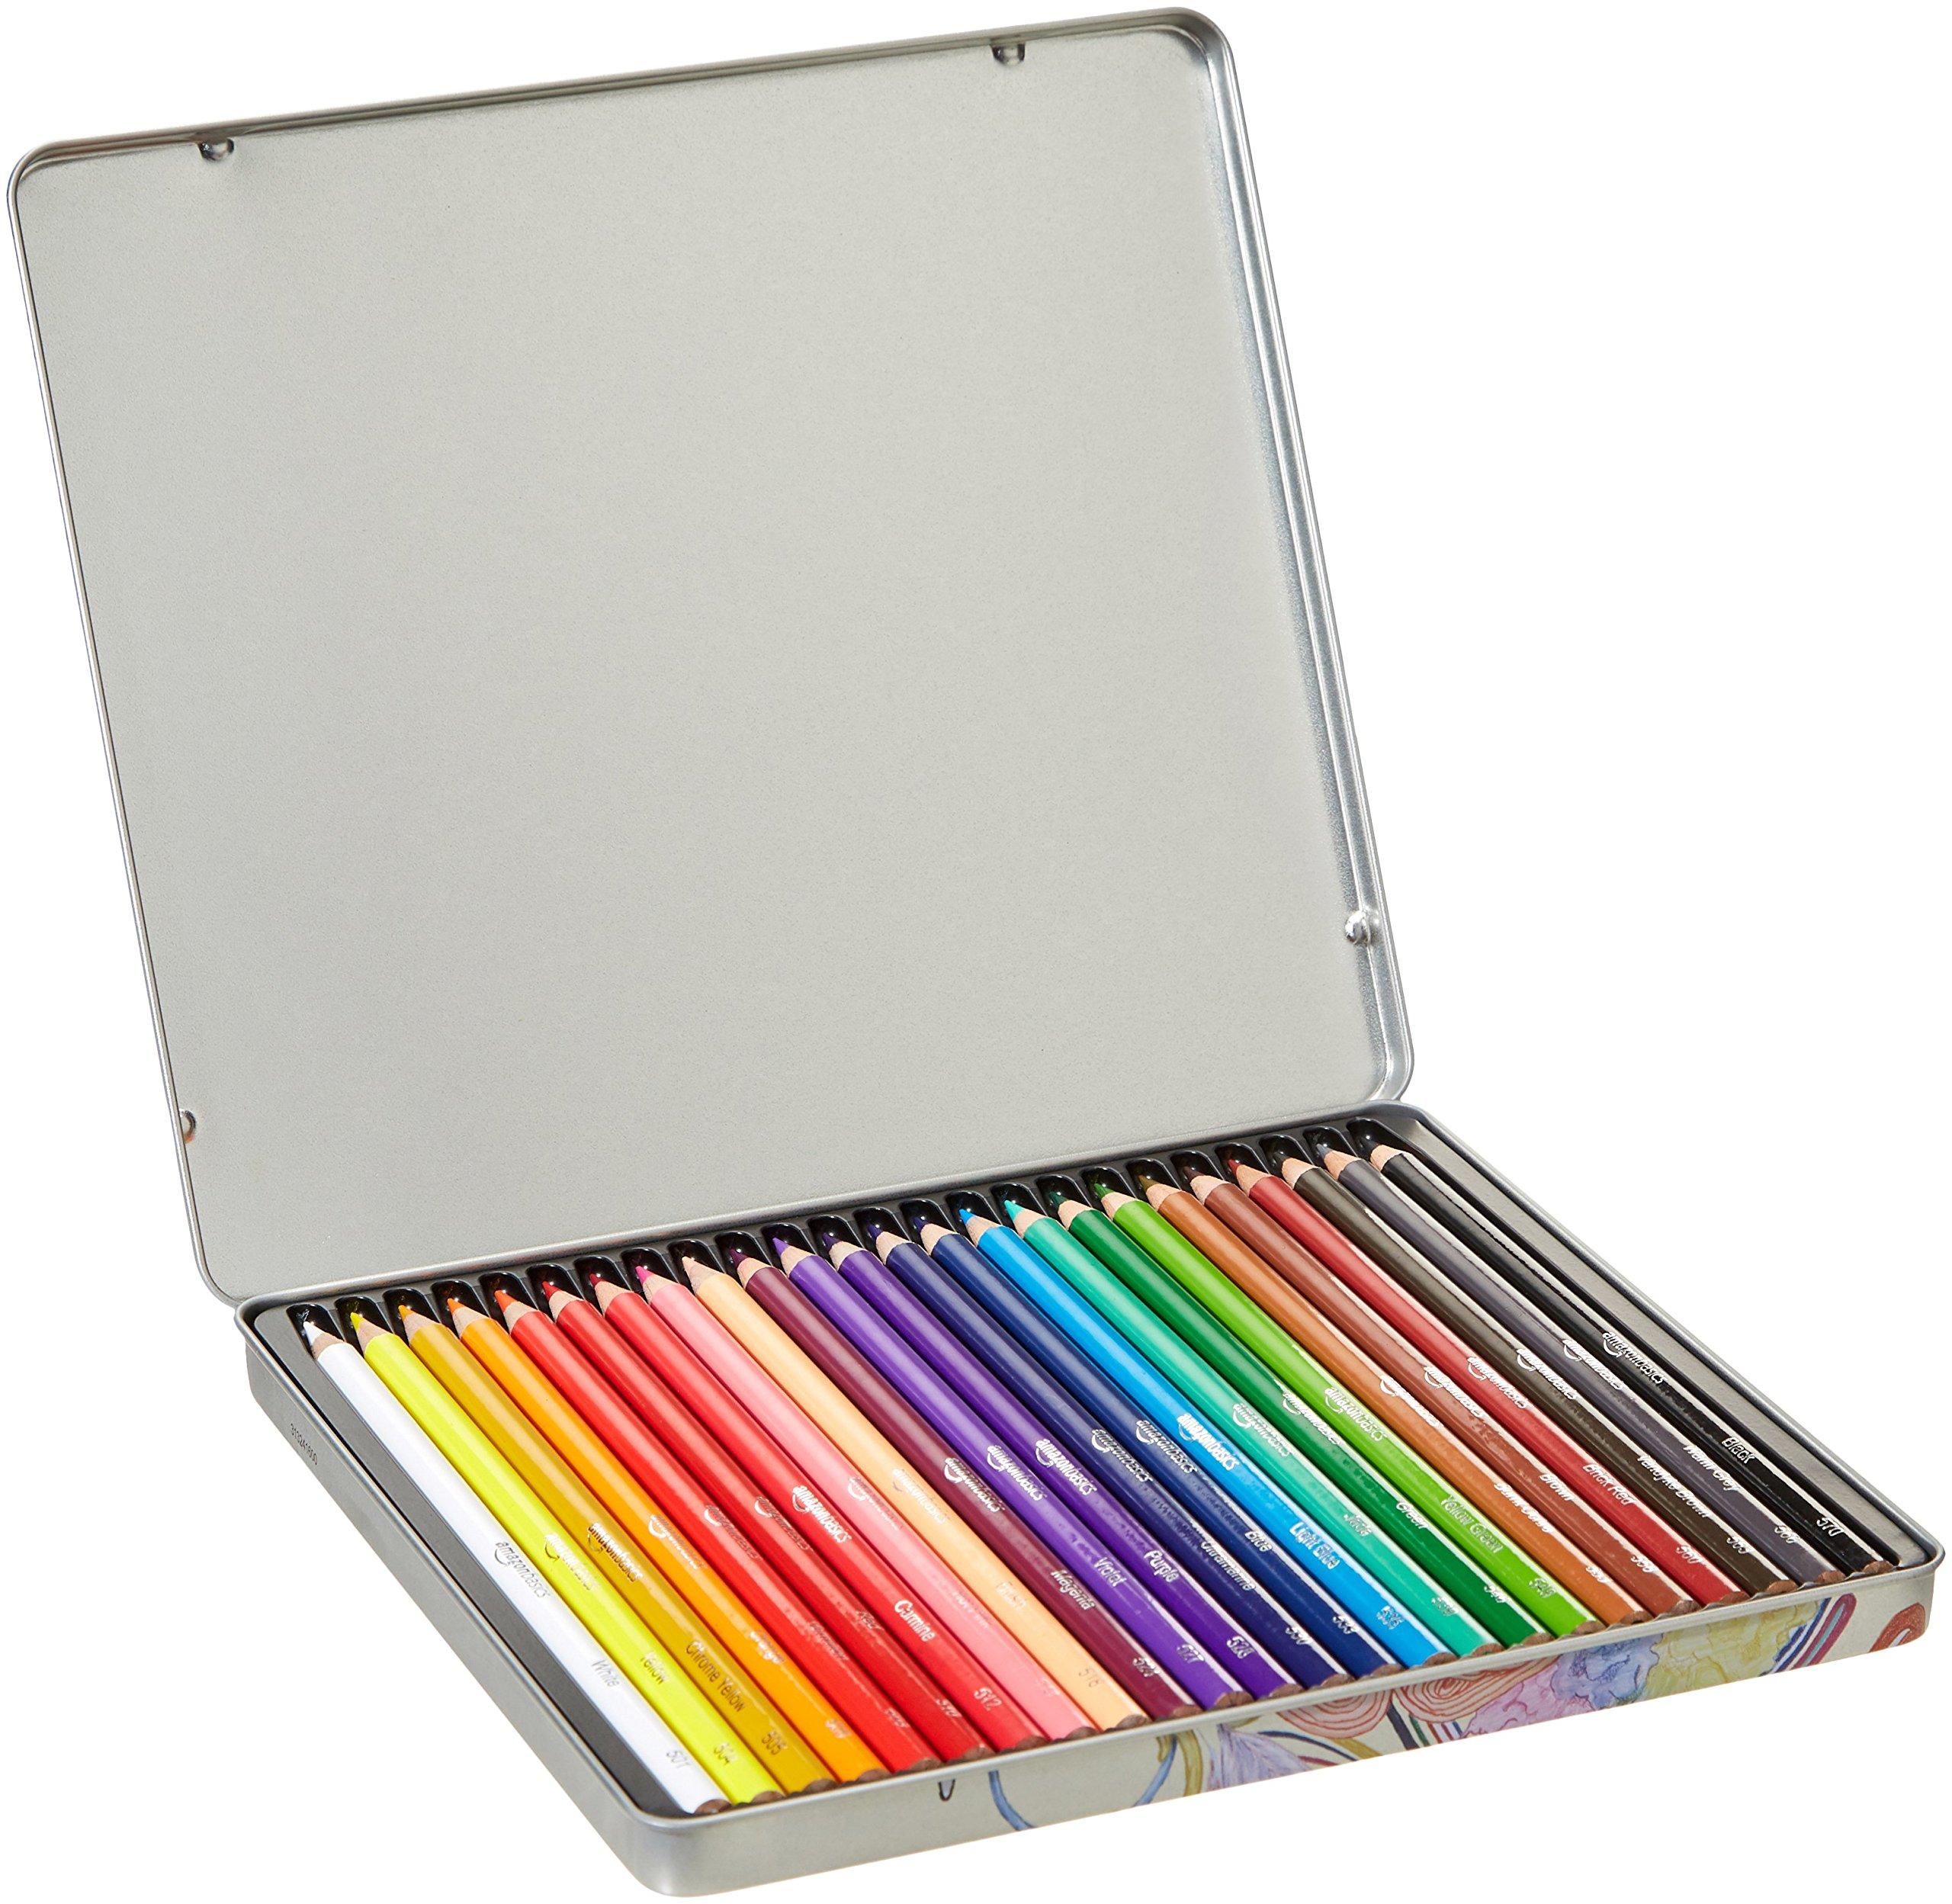 AmazonBasics Colored Pencils - 24-Count by AmazonBasics (Image #4)